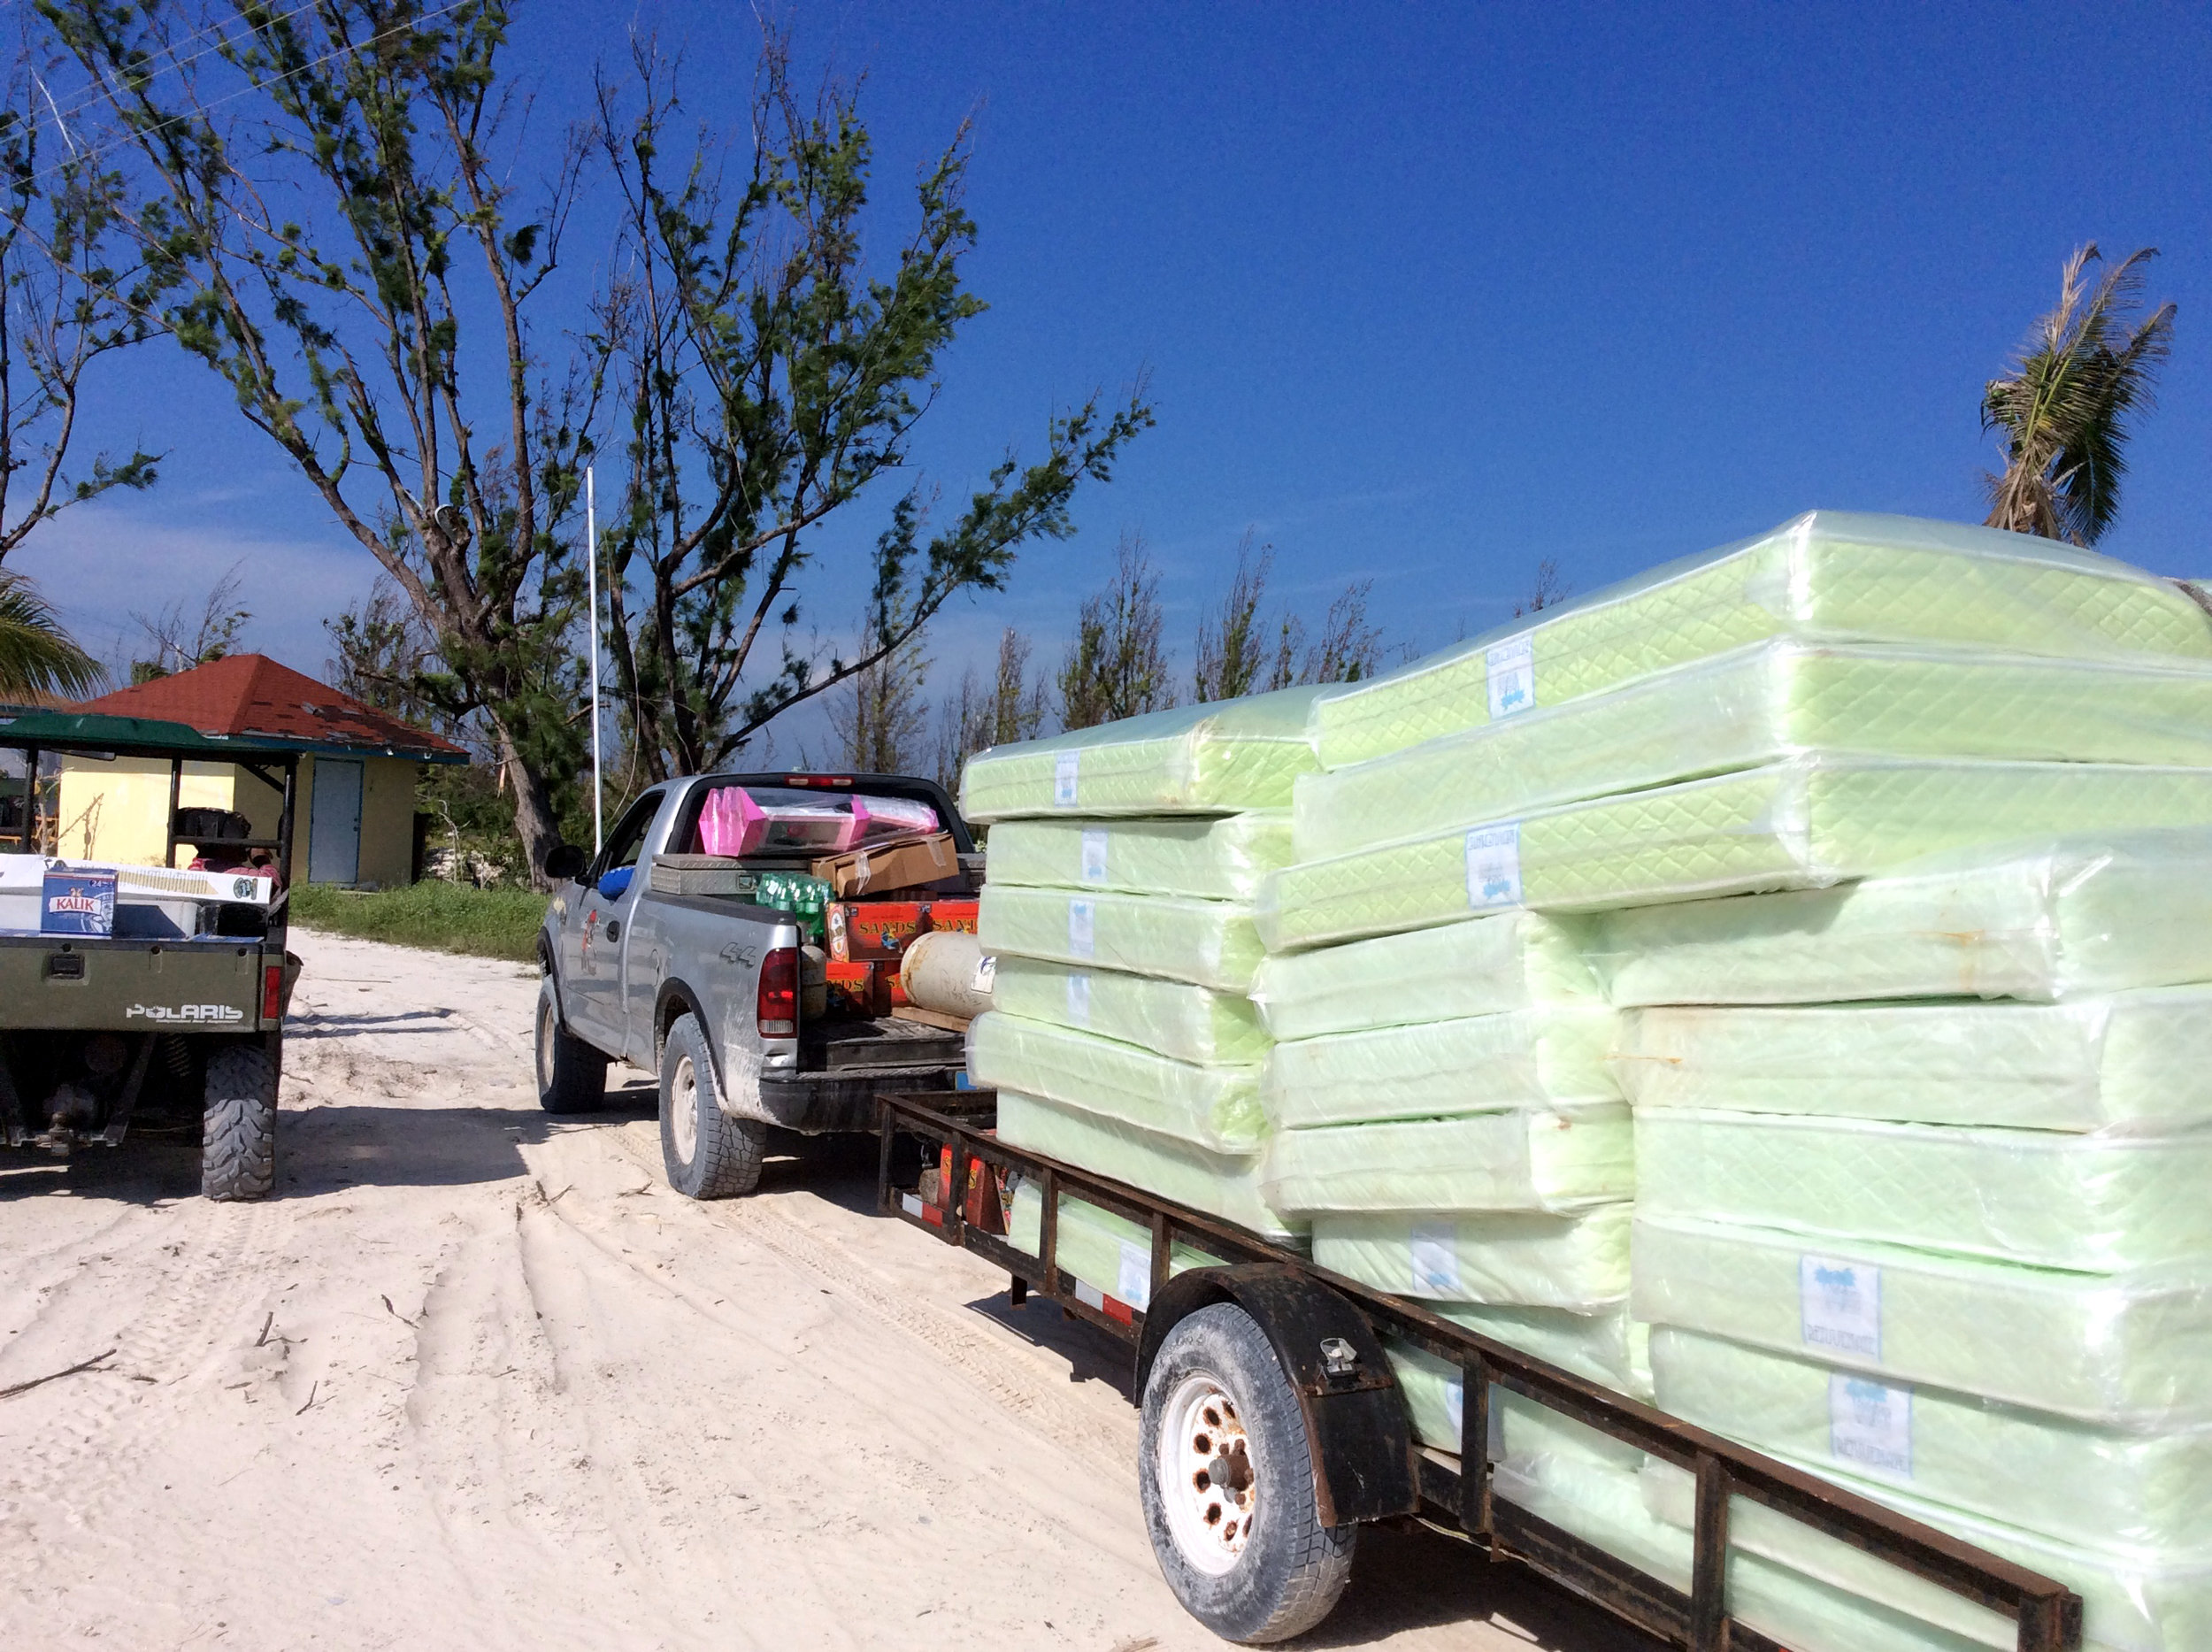 rum cay foundation relief (9).JPG